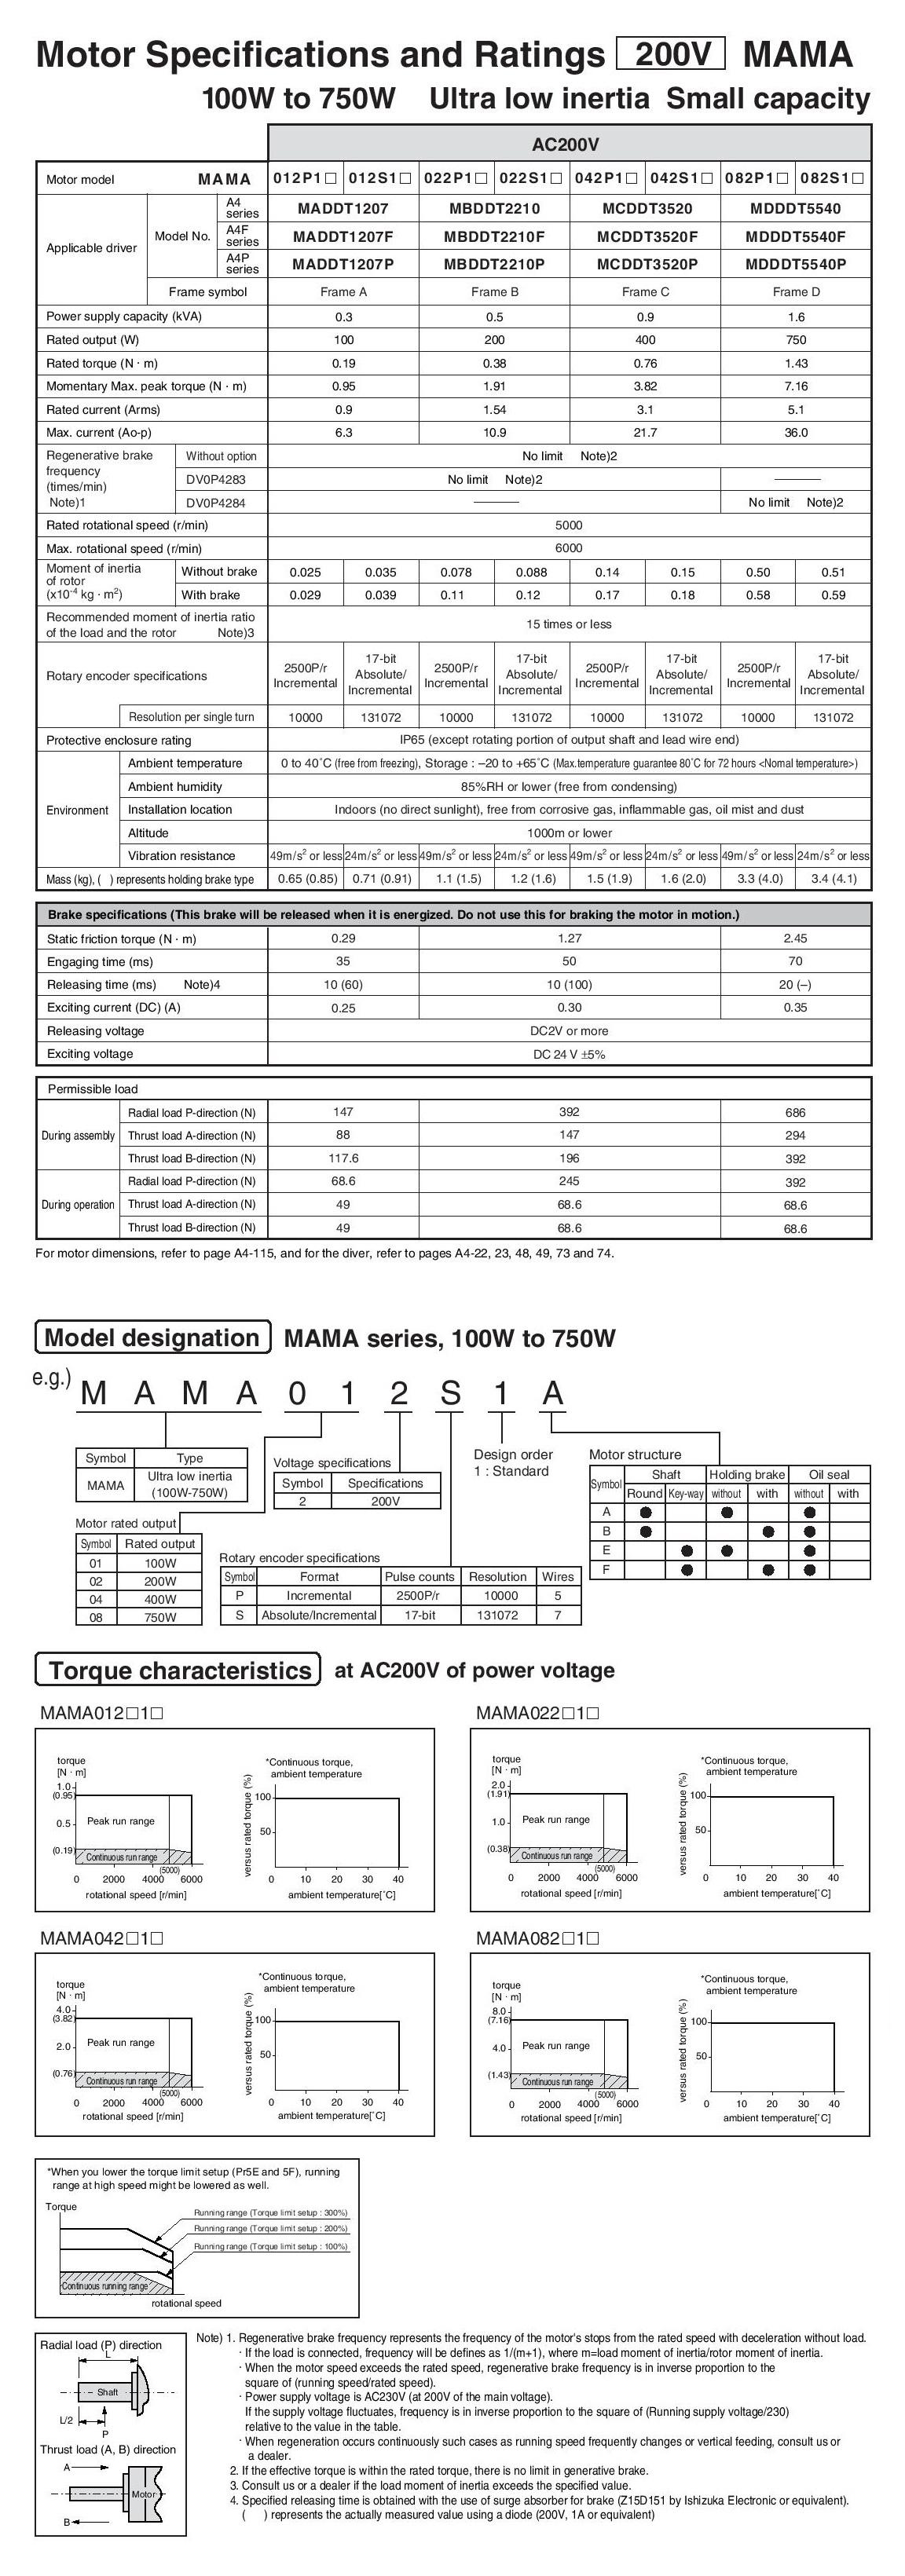 Panasonic: AC Servo Motors (MAMA A4 Series)